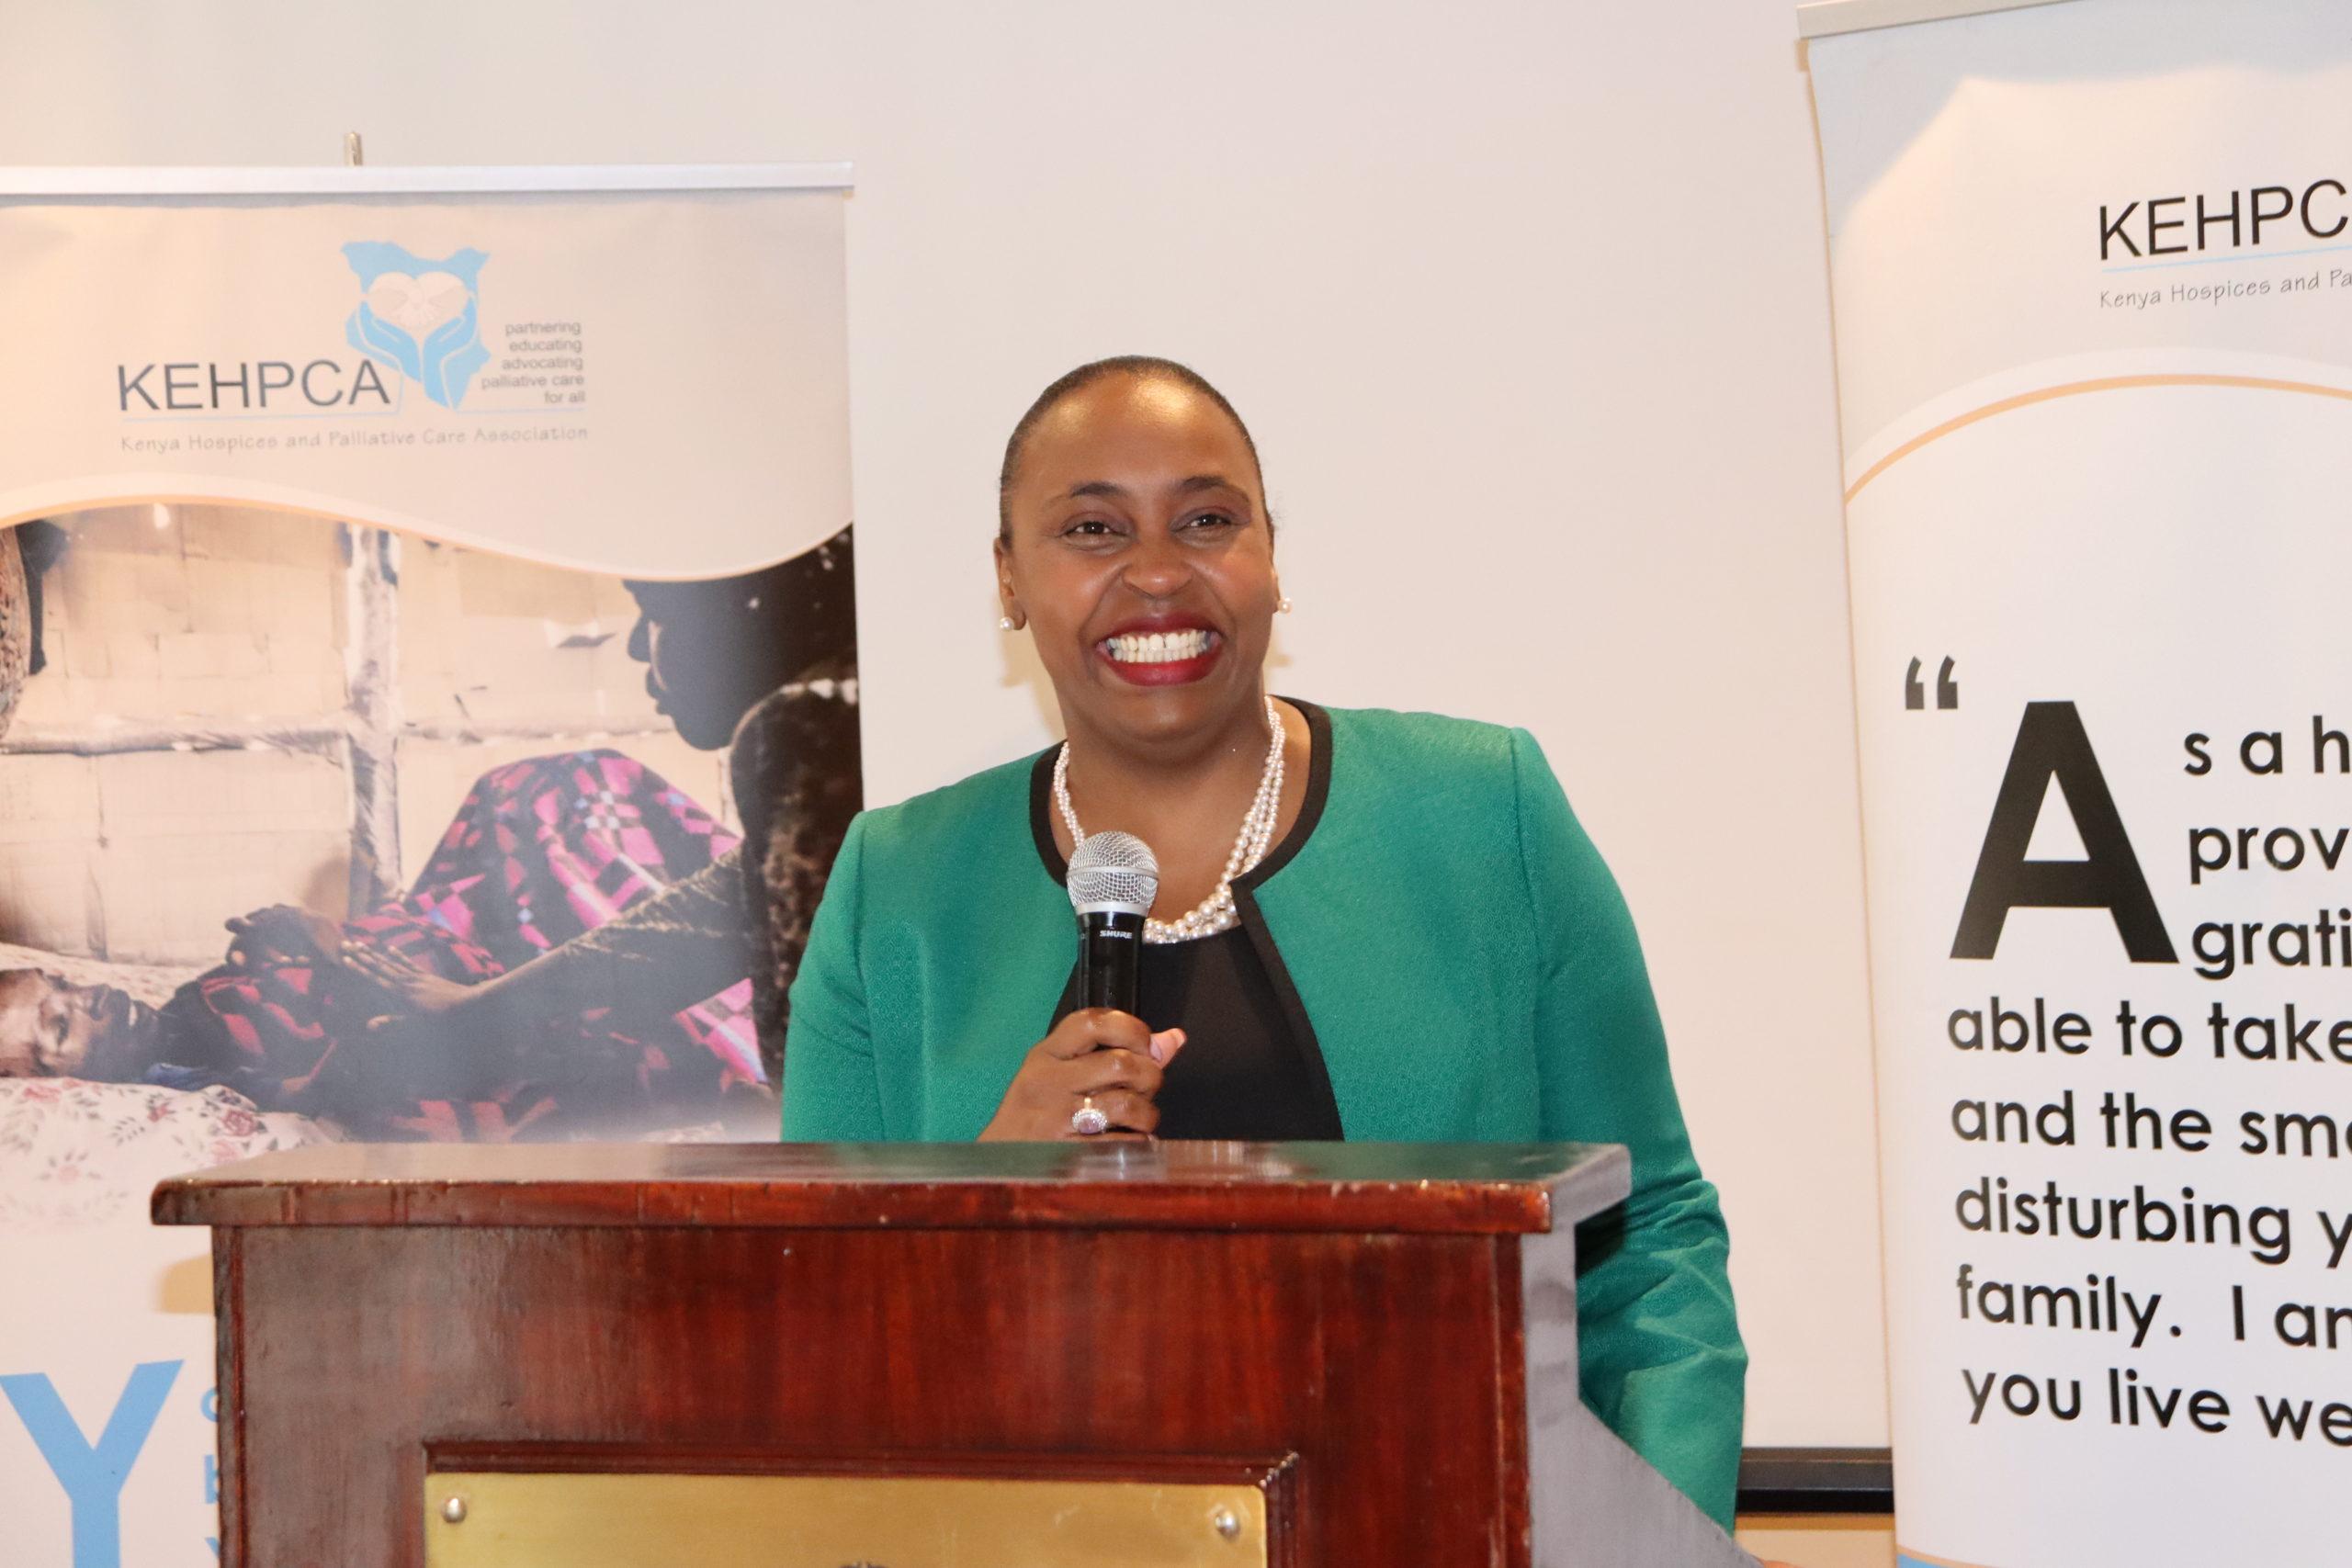 Kenya Hospices and Palliative Care Association Announces Kenya's Goodwill Ambassador for Palliative Care